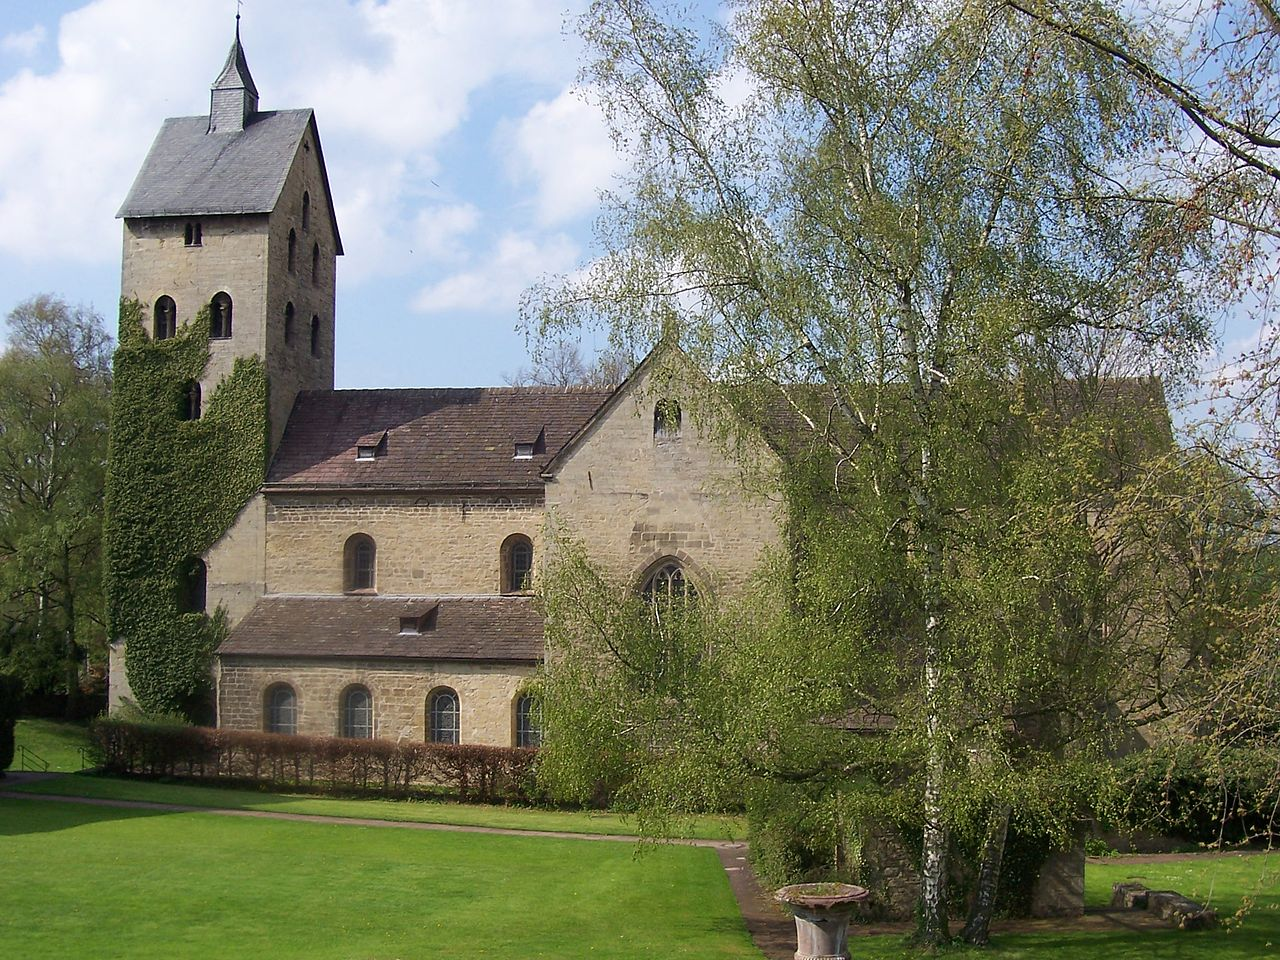 Bild Schloss Gehrden Brakel